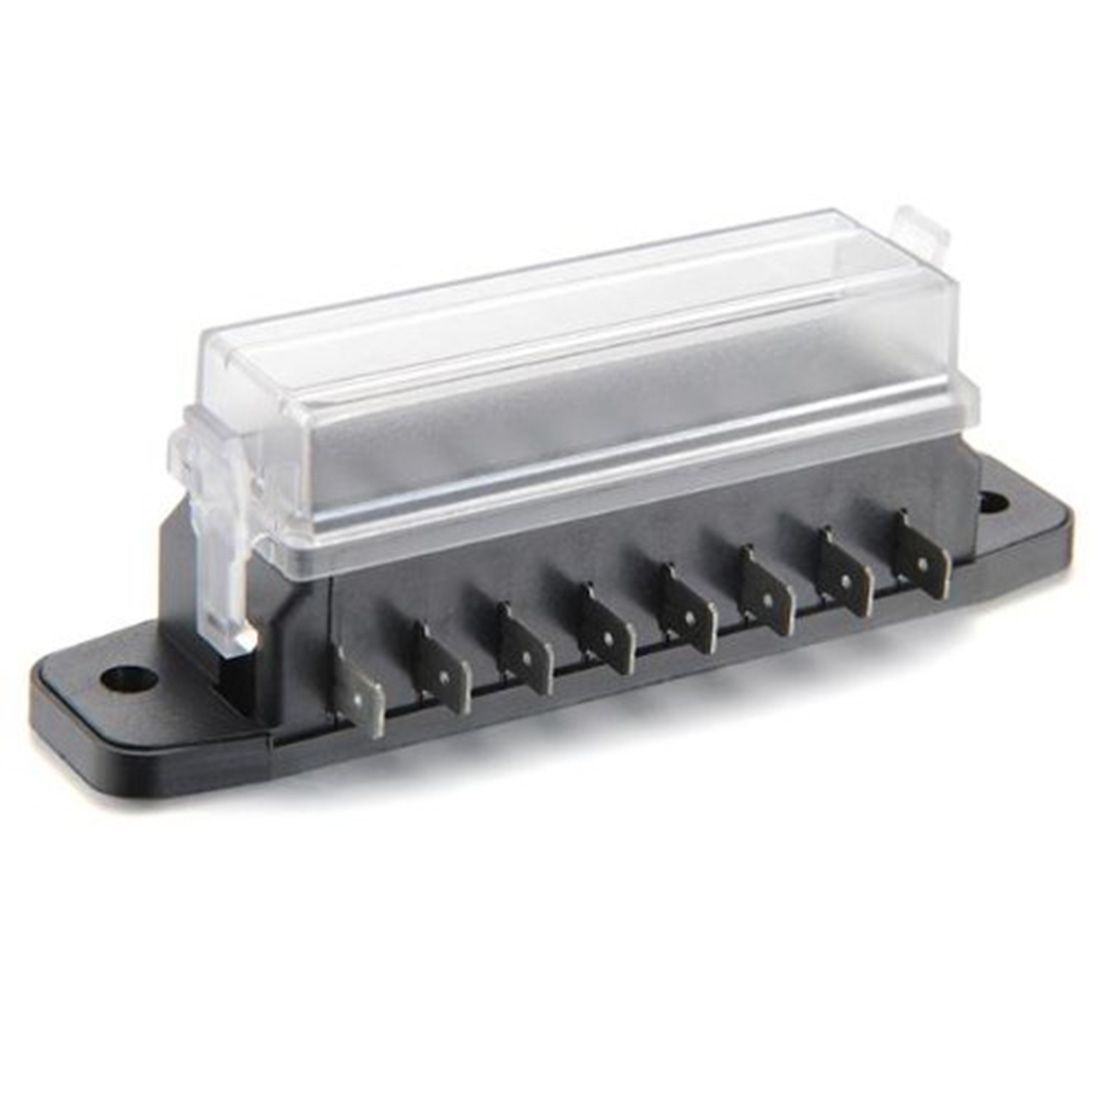 Brand New 12v 8 Way Car Truck Automotive Auto Blade Fuse Box Block Holder Circuit